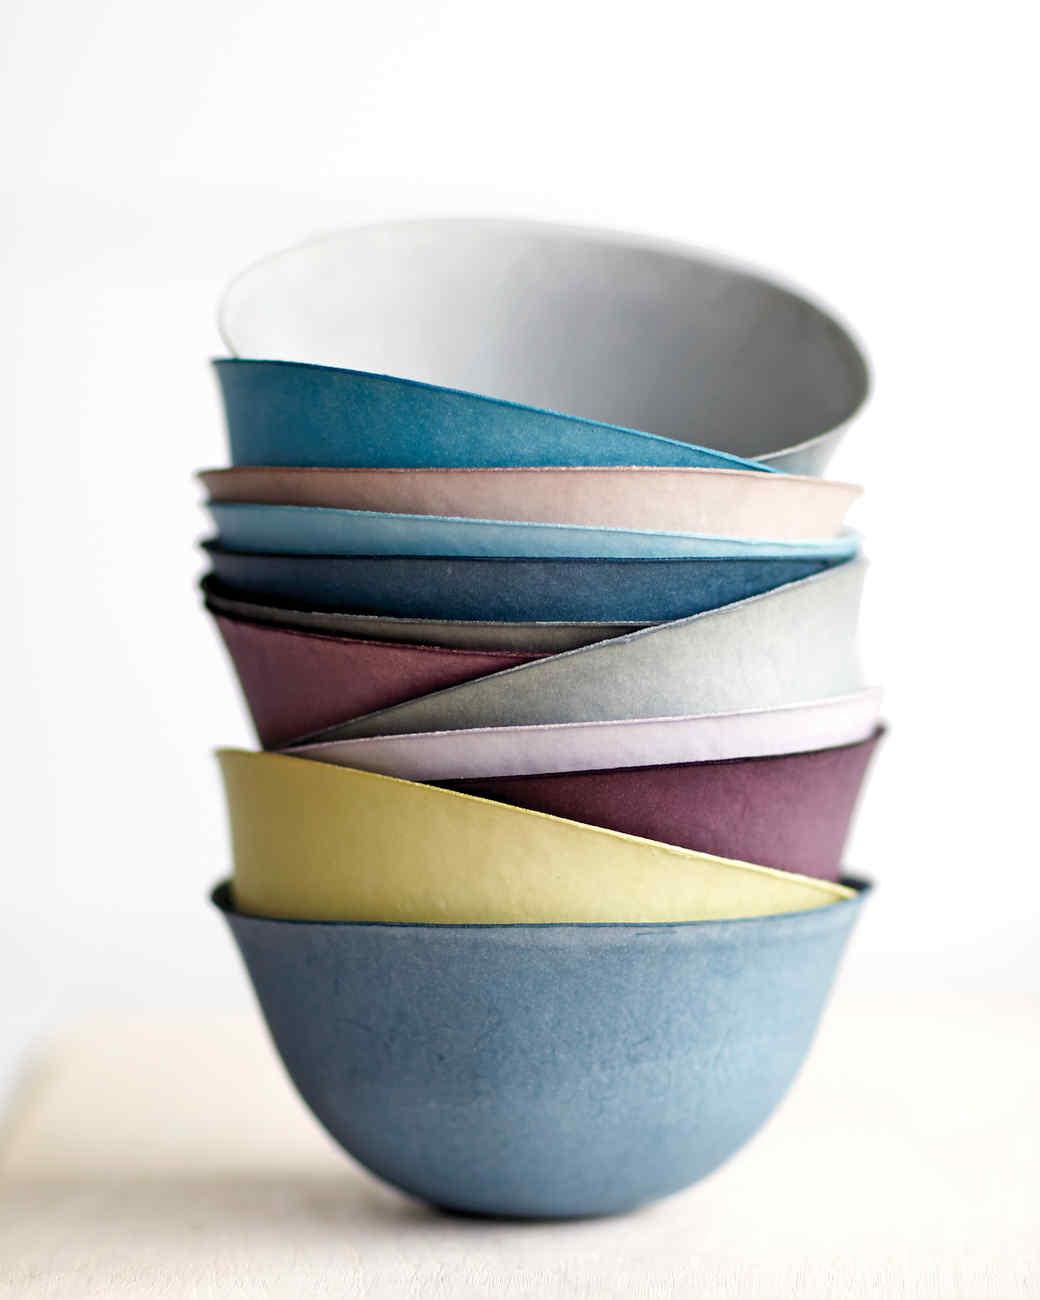 bowl-stack-tight-1-d111888.jpg